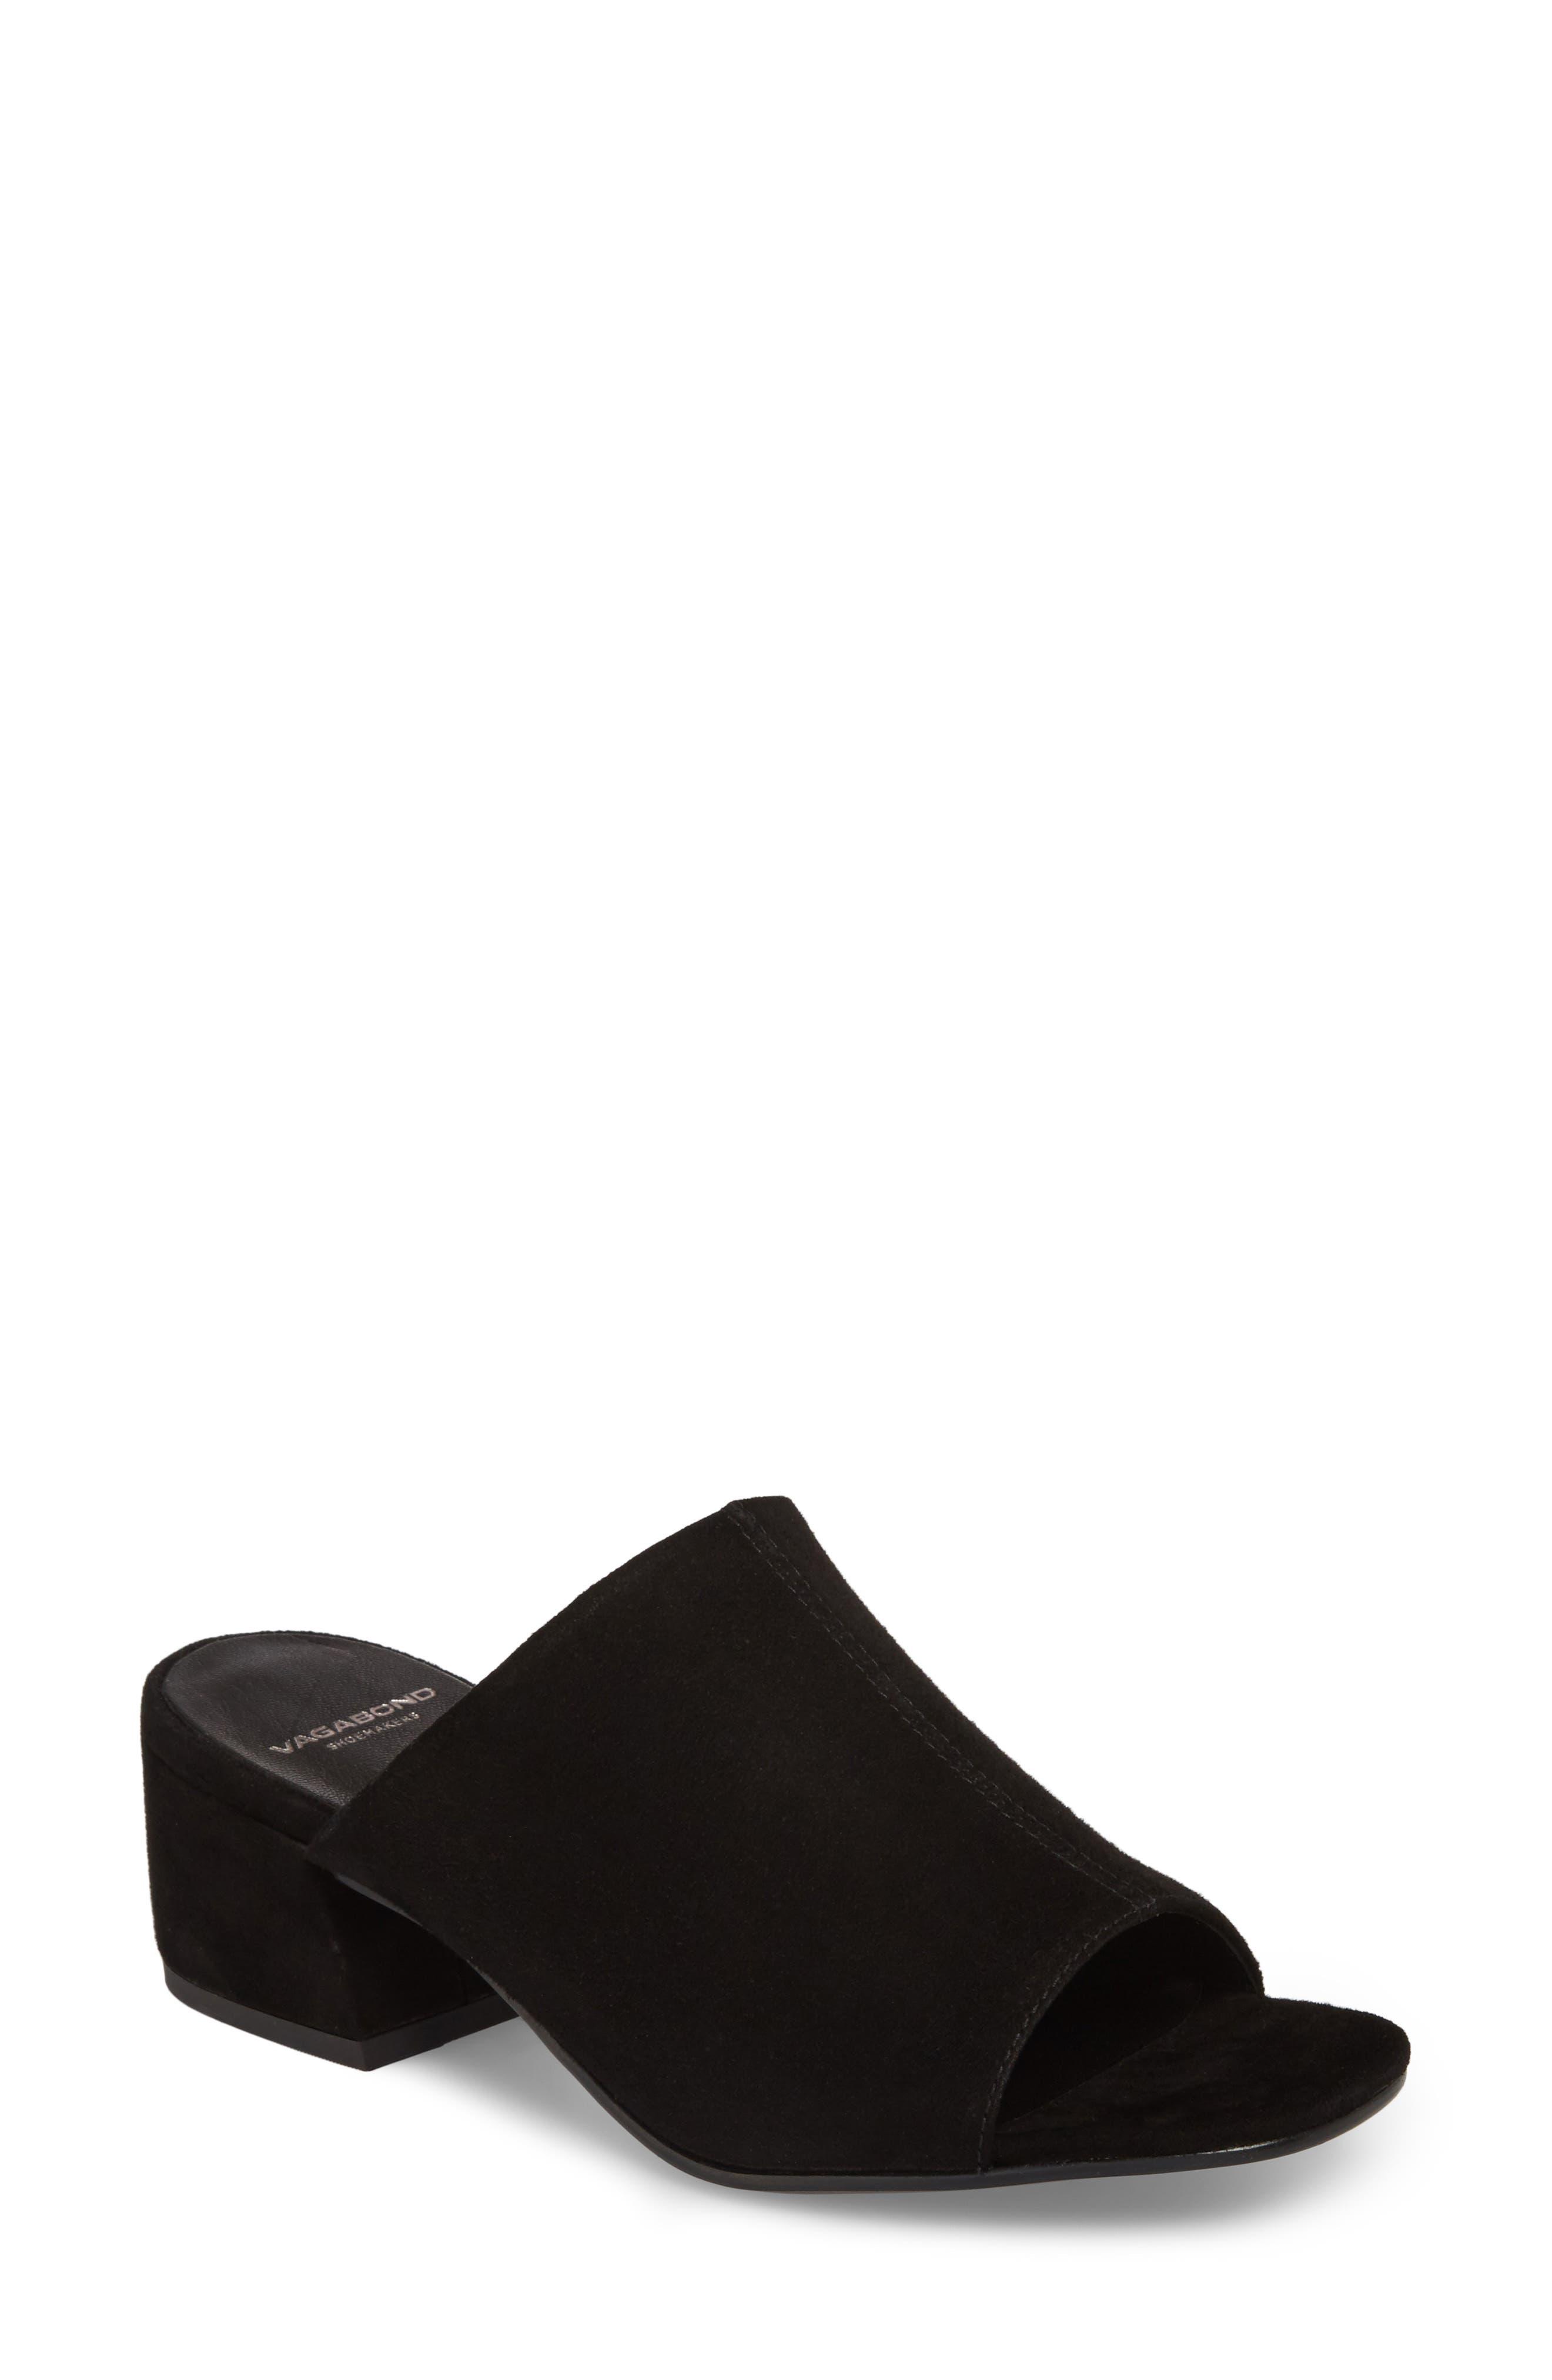 Vagabond Shoemakers Saide Slide Sandal, Black